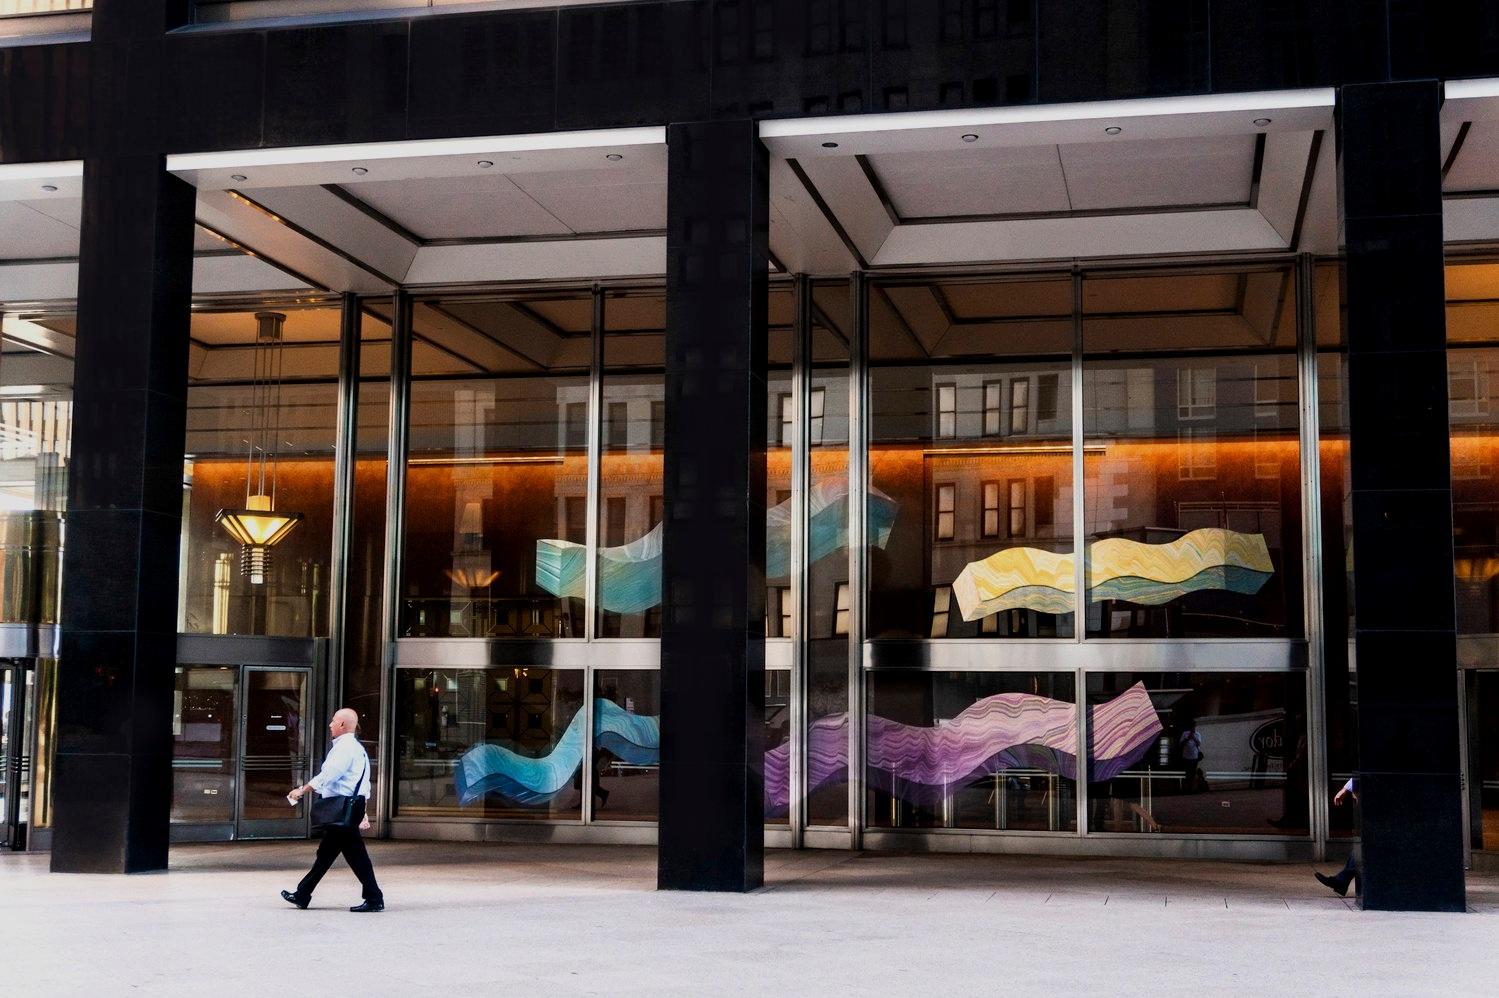 Reclining Colonnade, 2018 One New York Plaza, New York, NY